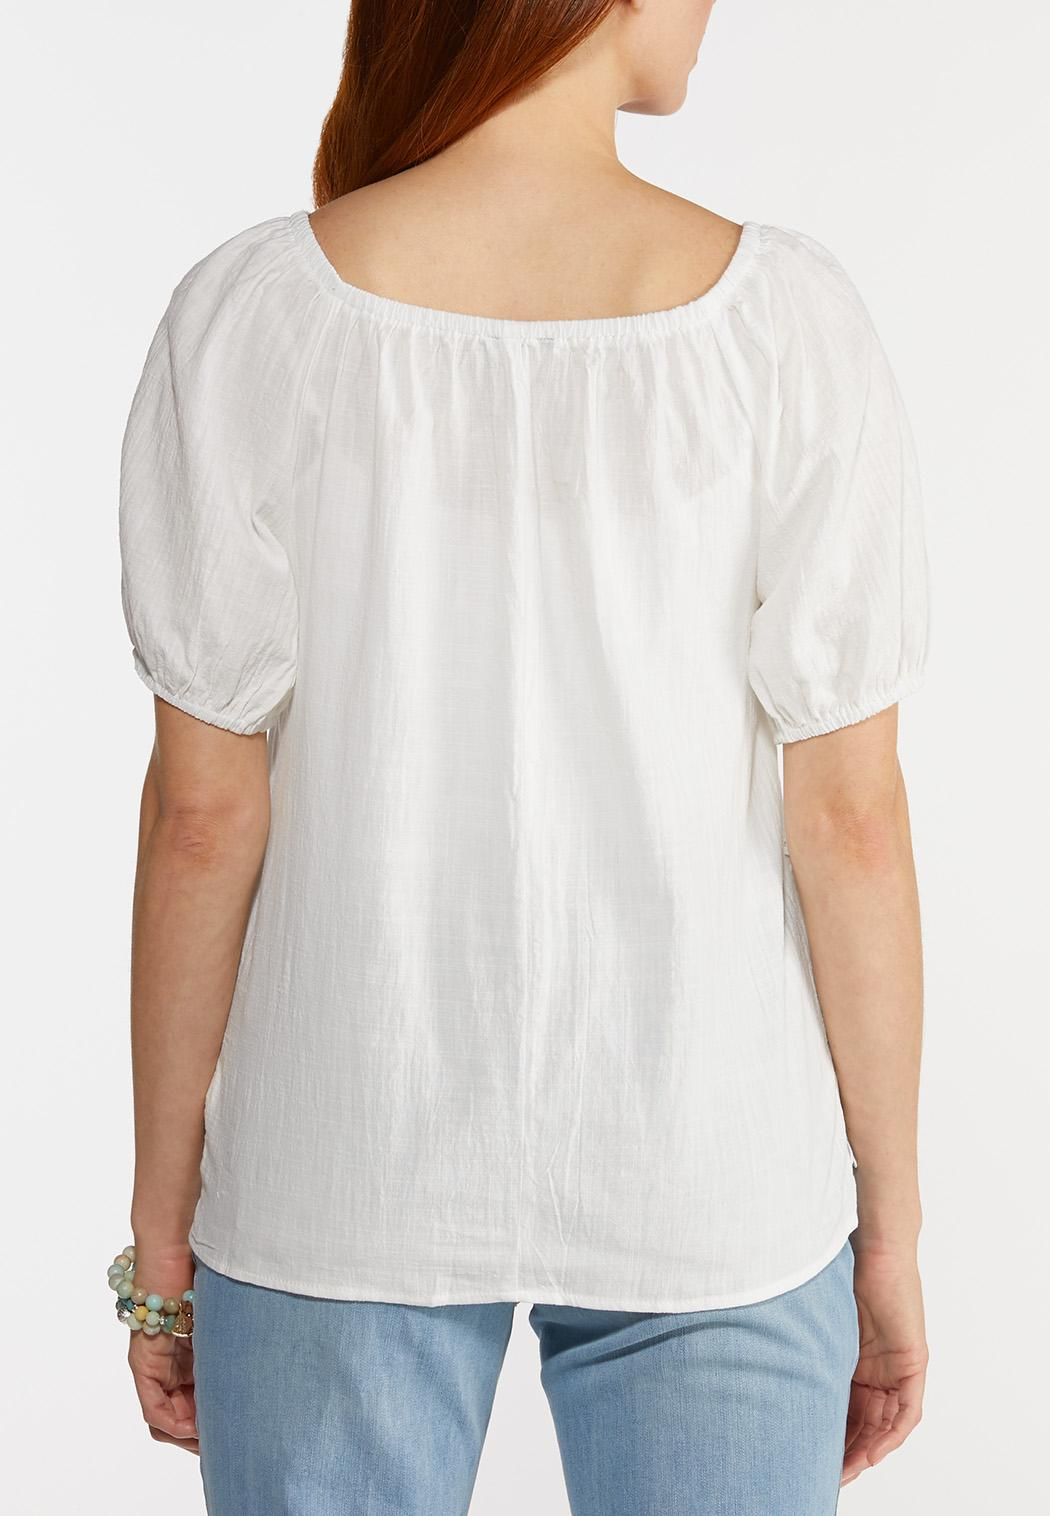 Scalloped Lace Hem Top (Item #44313090)